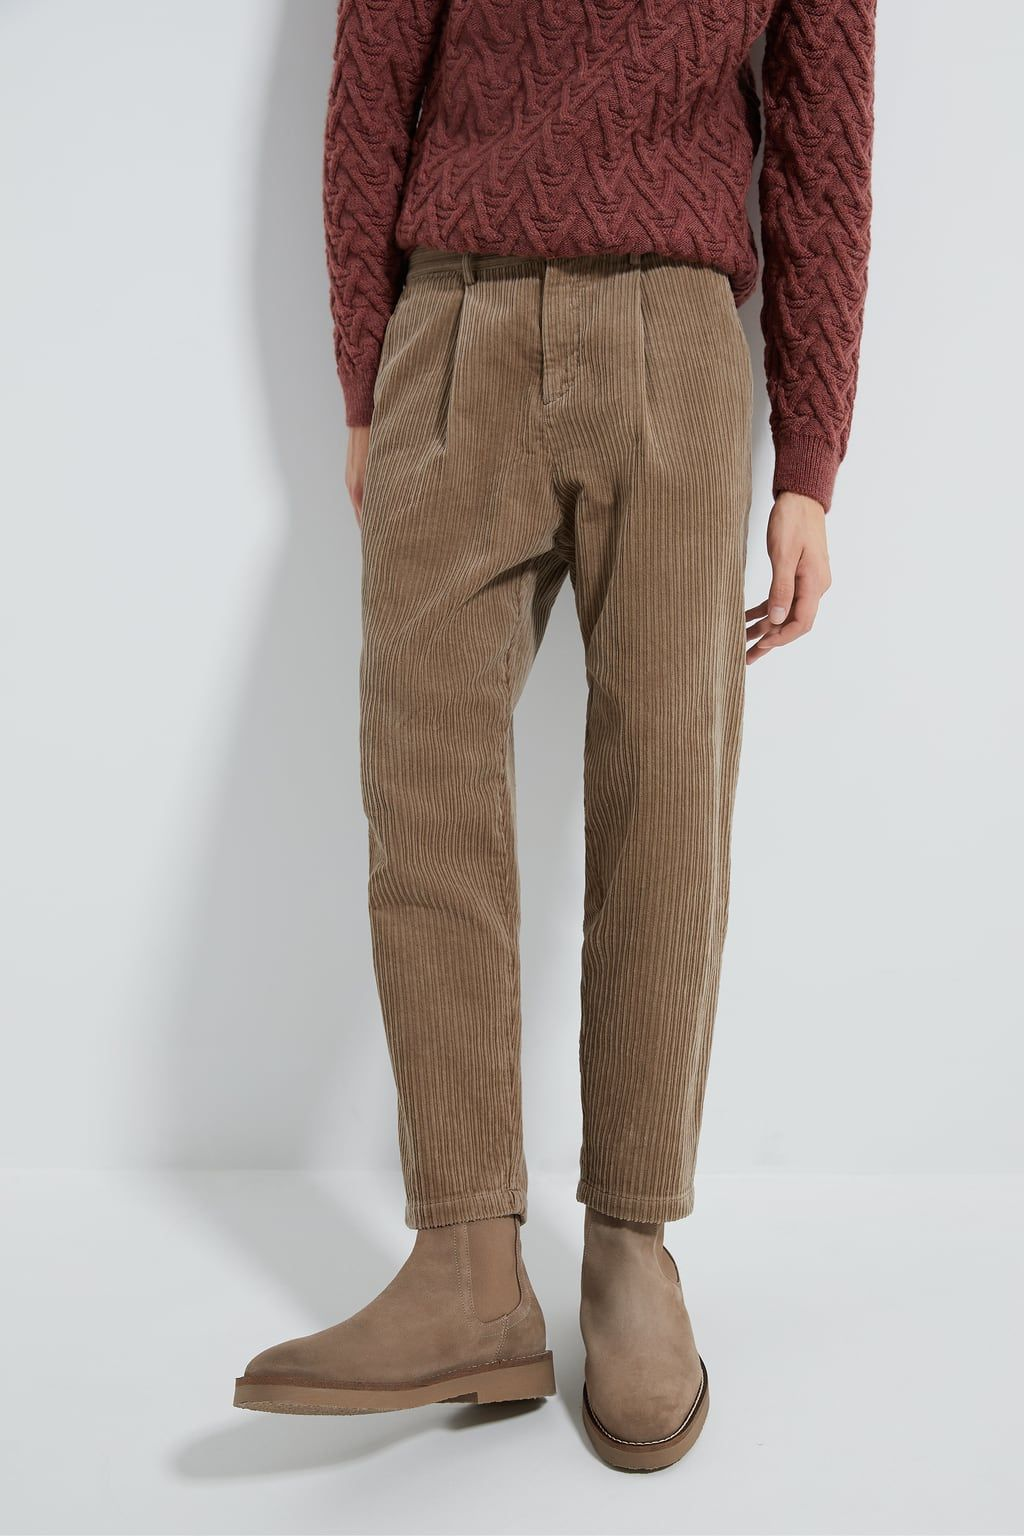 أو كنز في معظم الحالات Zara Mens Pleated Trousers Costaricarealestateproperty Com